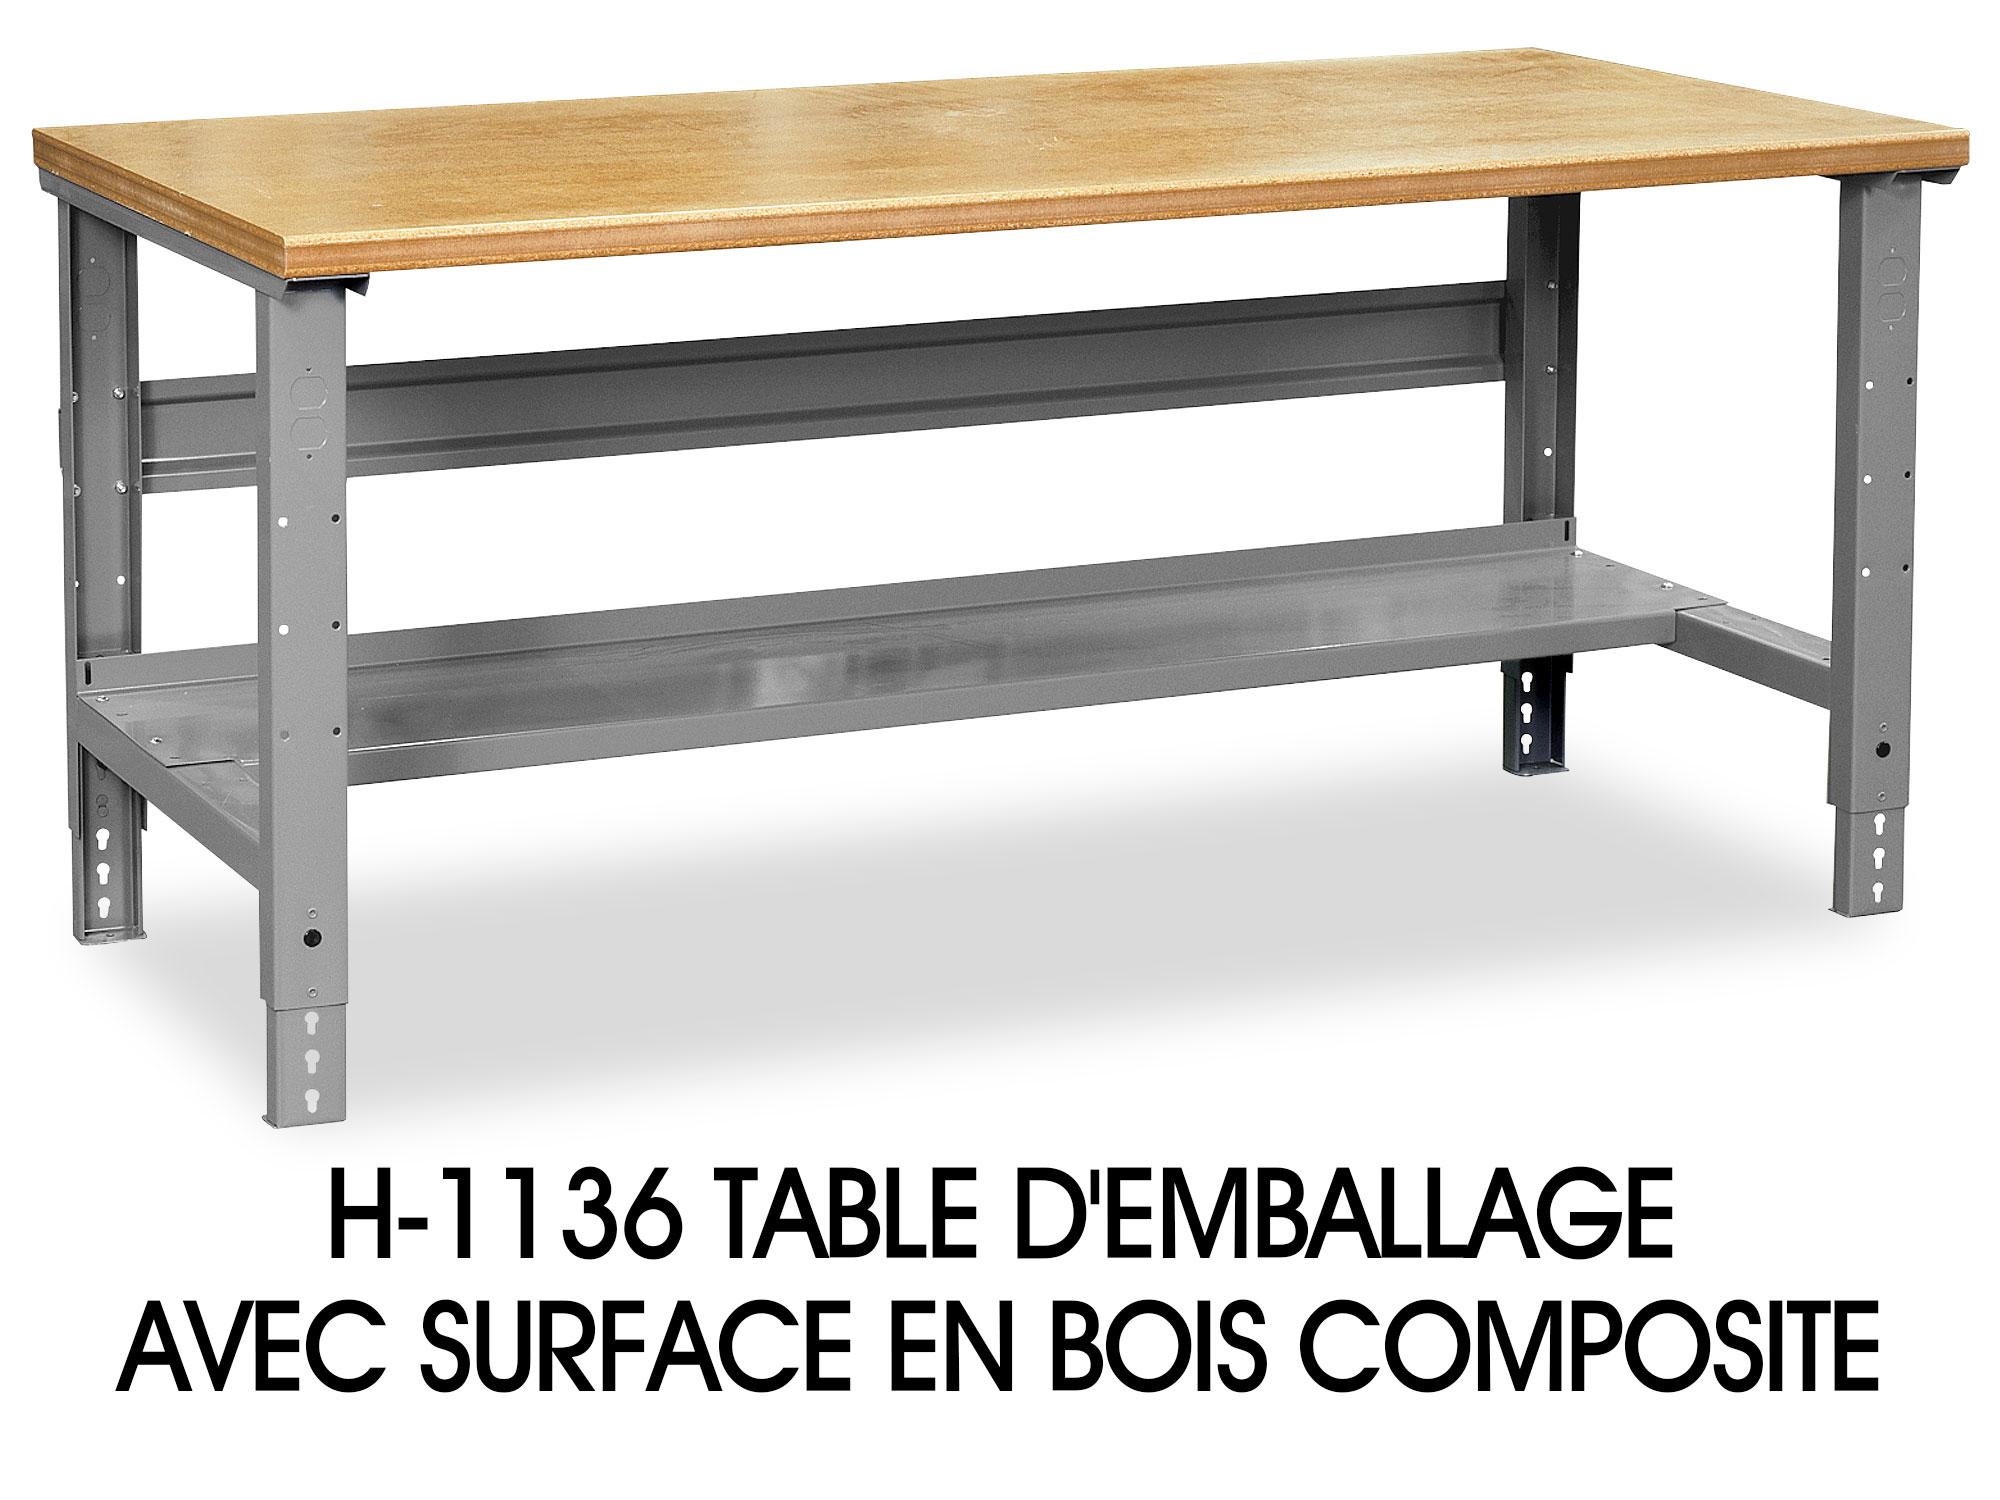 Surface pour table d'emballage